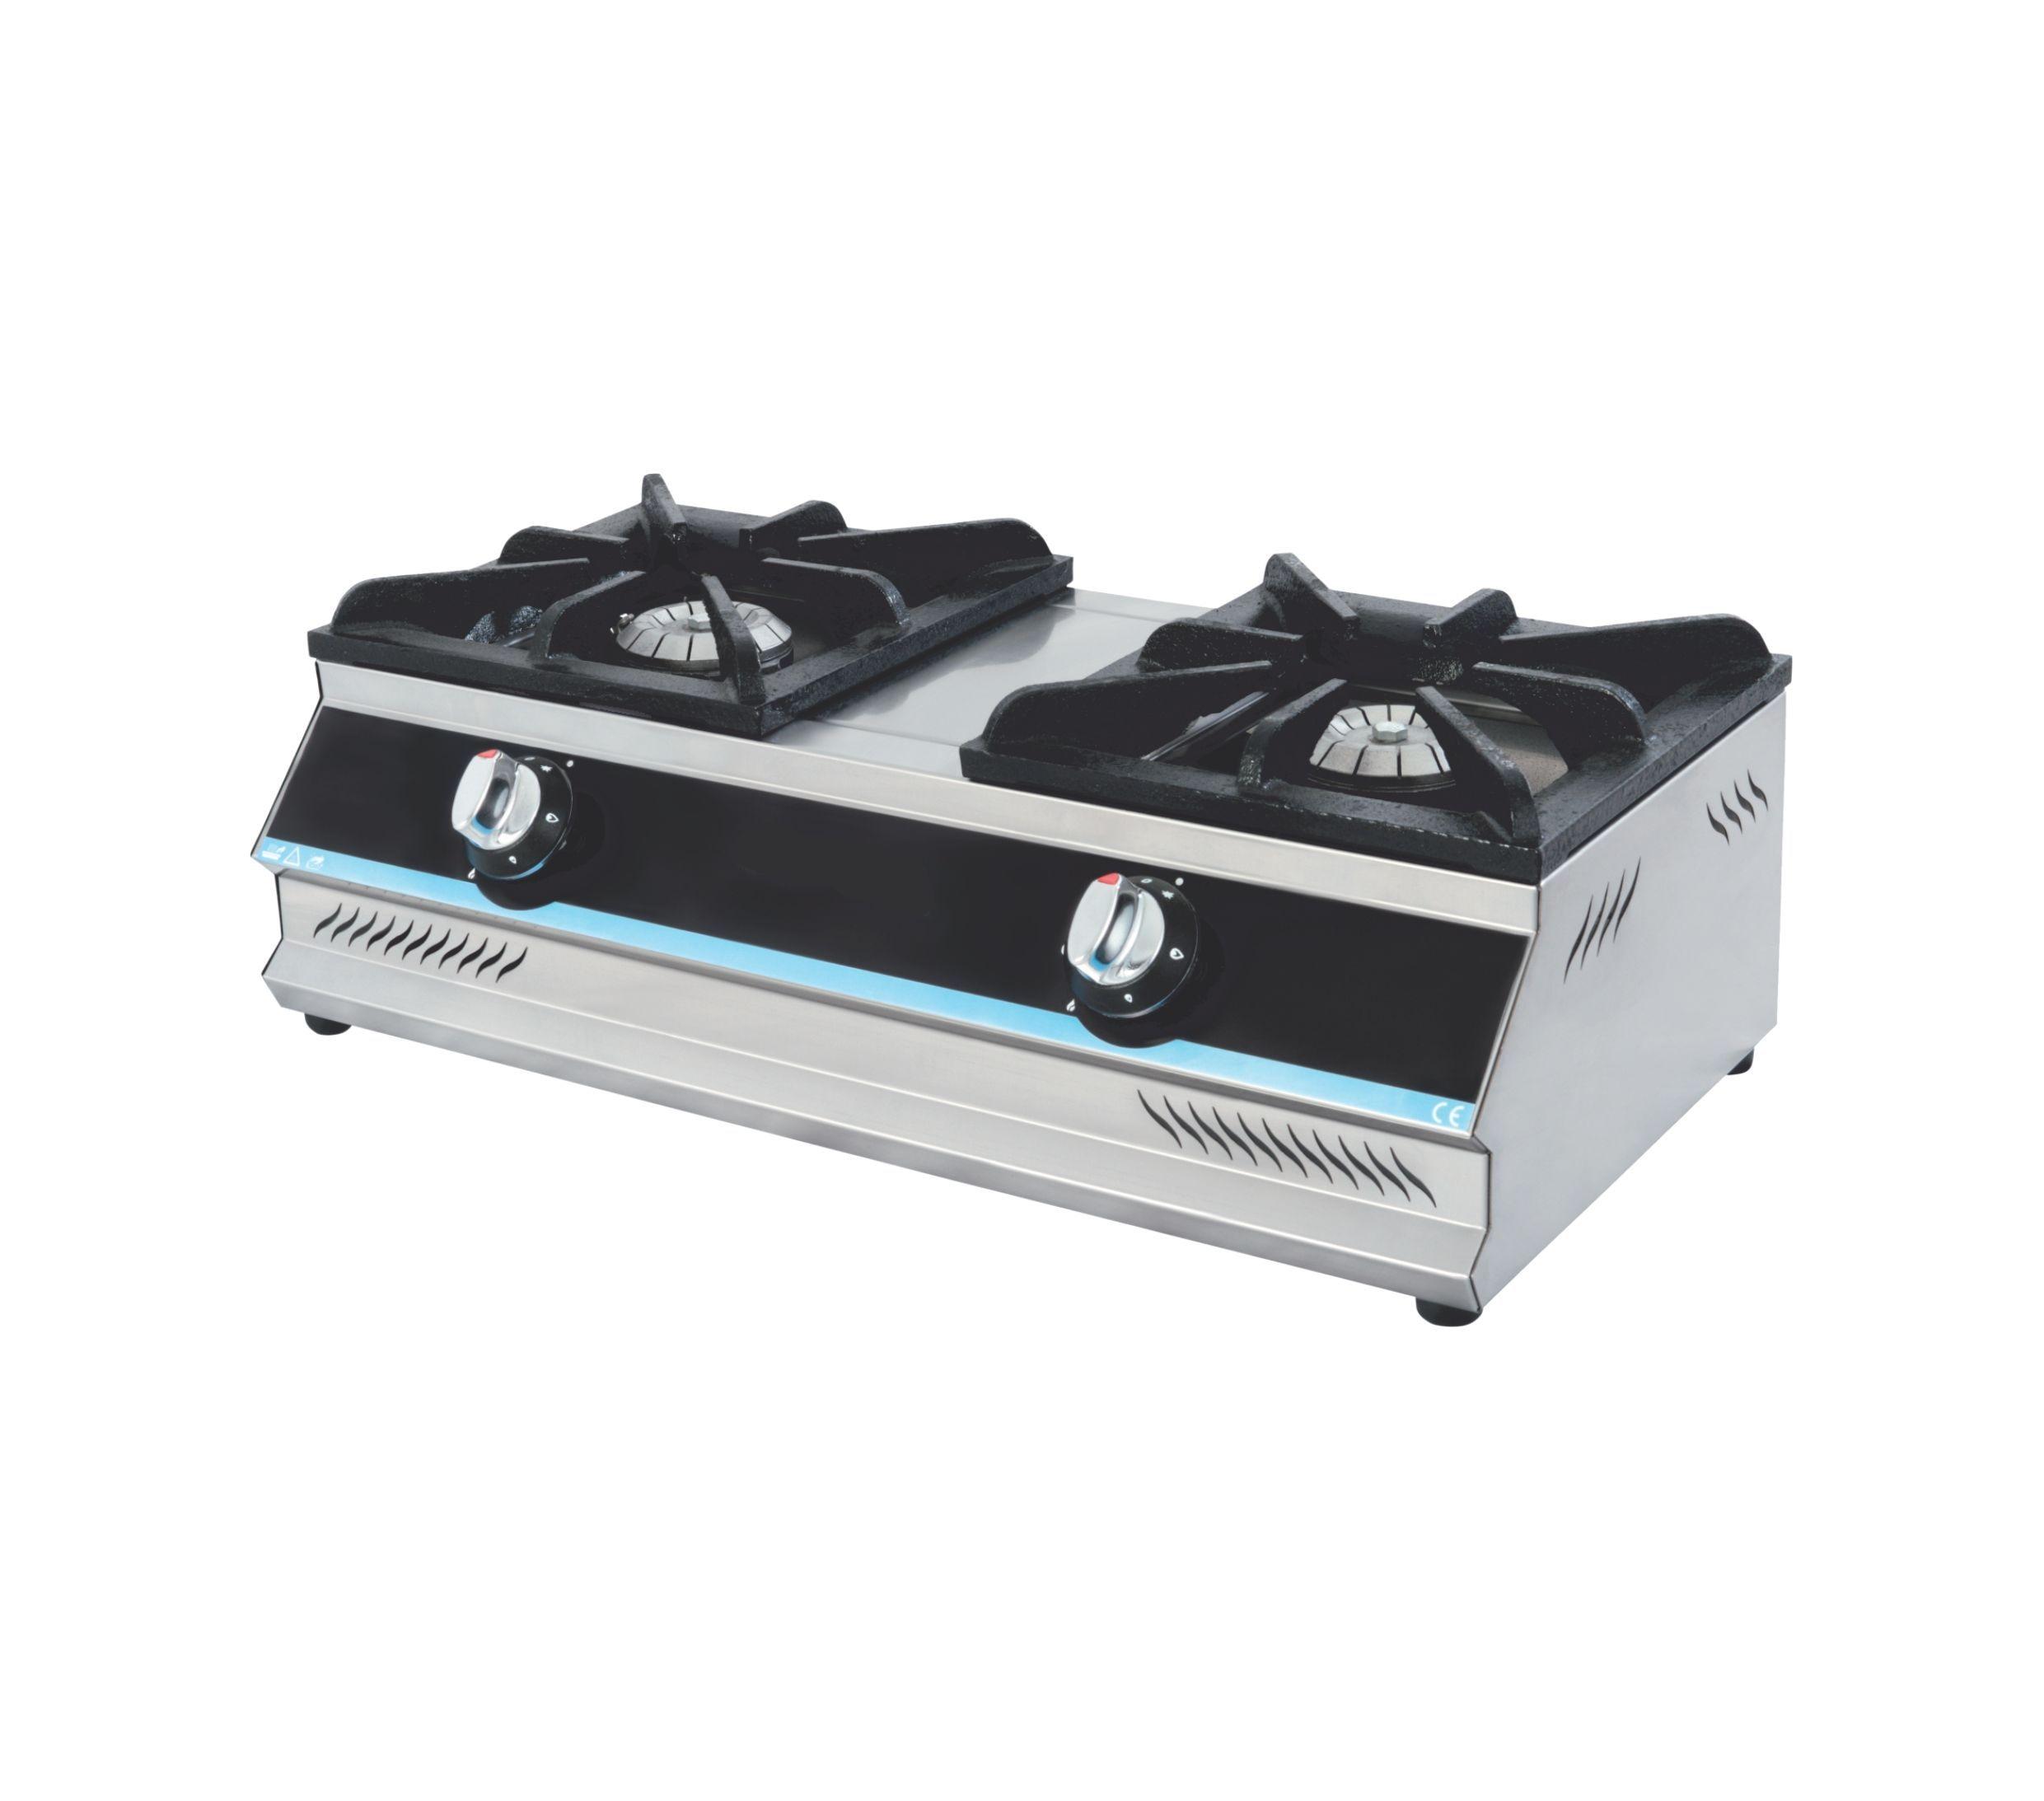 KUTLU 2 Cooktop Cooker (Gas)